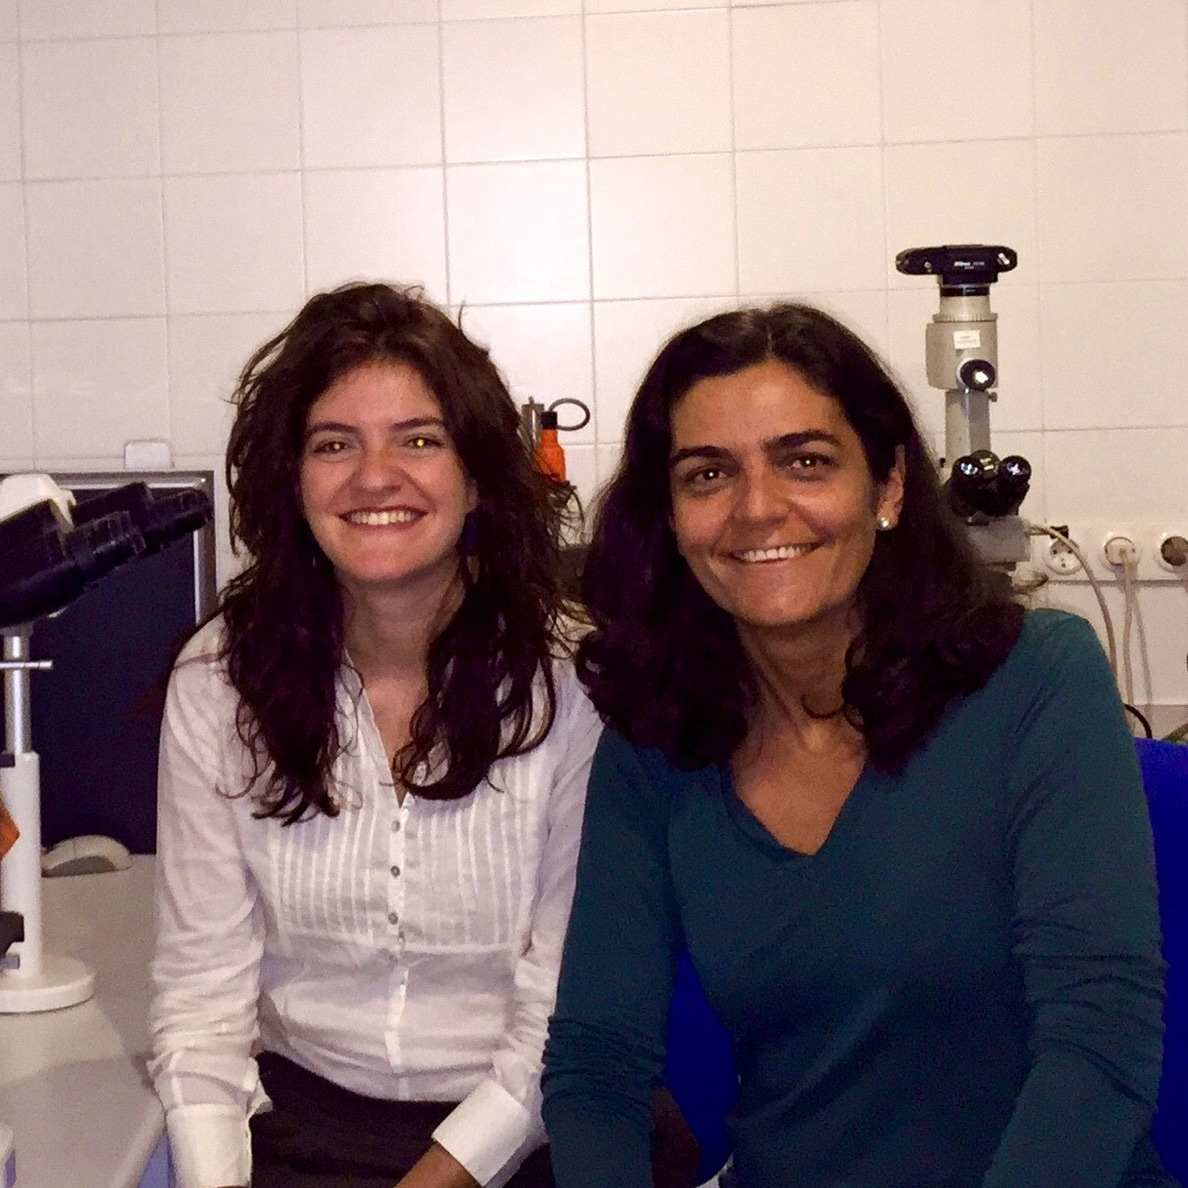 Lidia Fernandez-Paredes, Silvia Sanchez-Ramon, Multiple Sclerosis, MS, Biomarkers